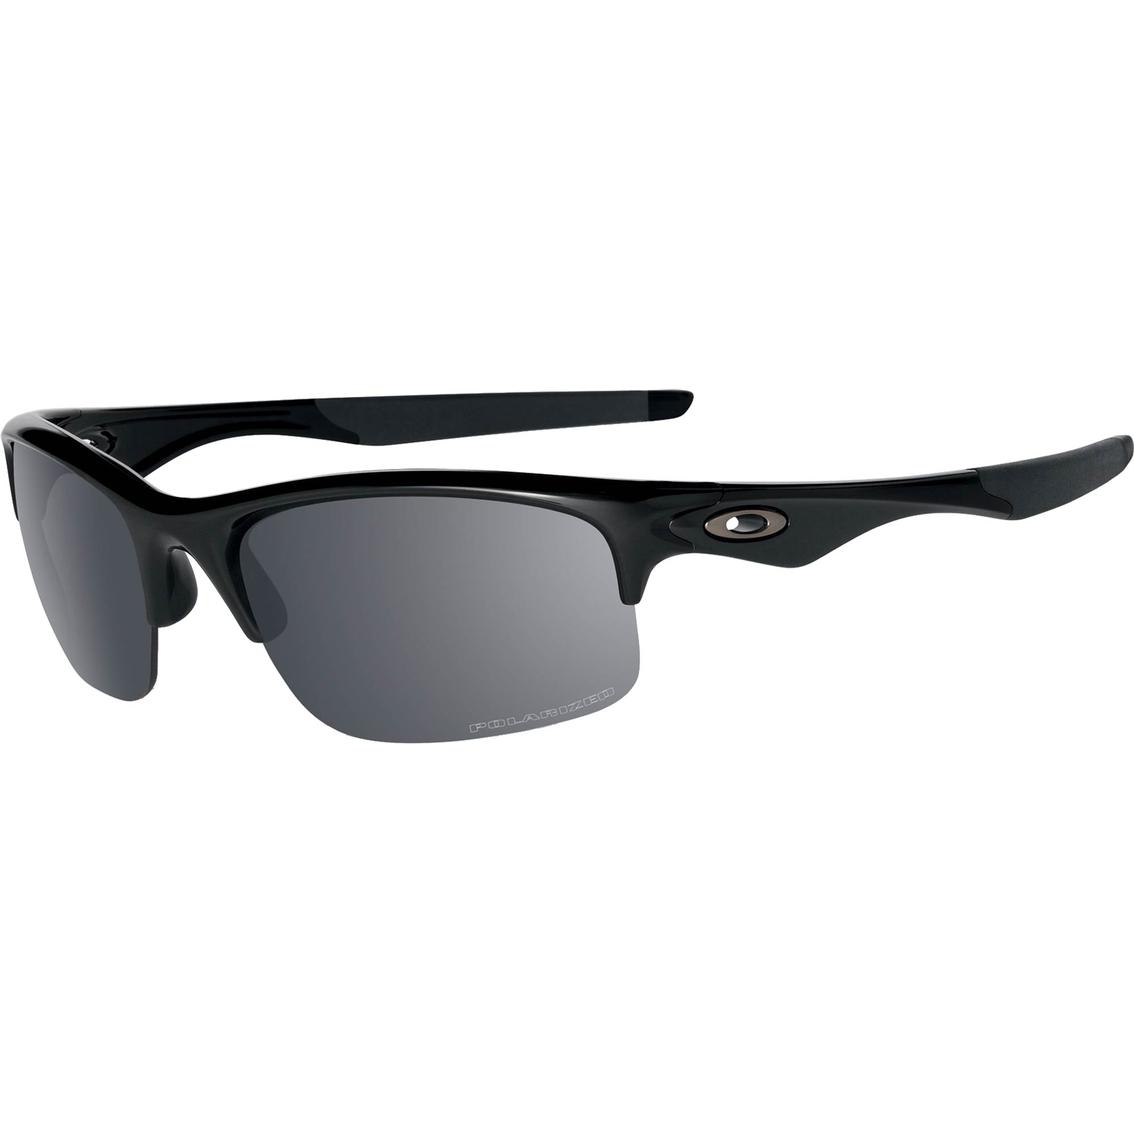 8dbb3b18e8f Oakley Bottle Rocket Iridium Polarized Sunglasses